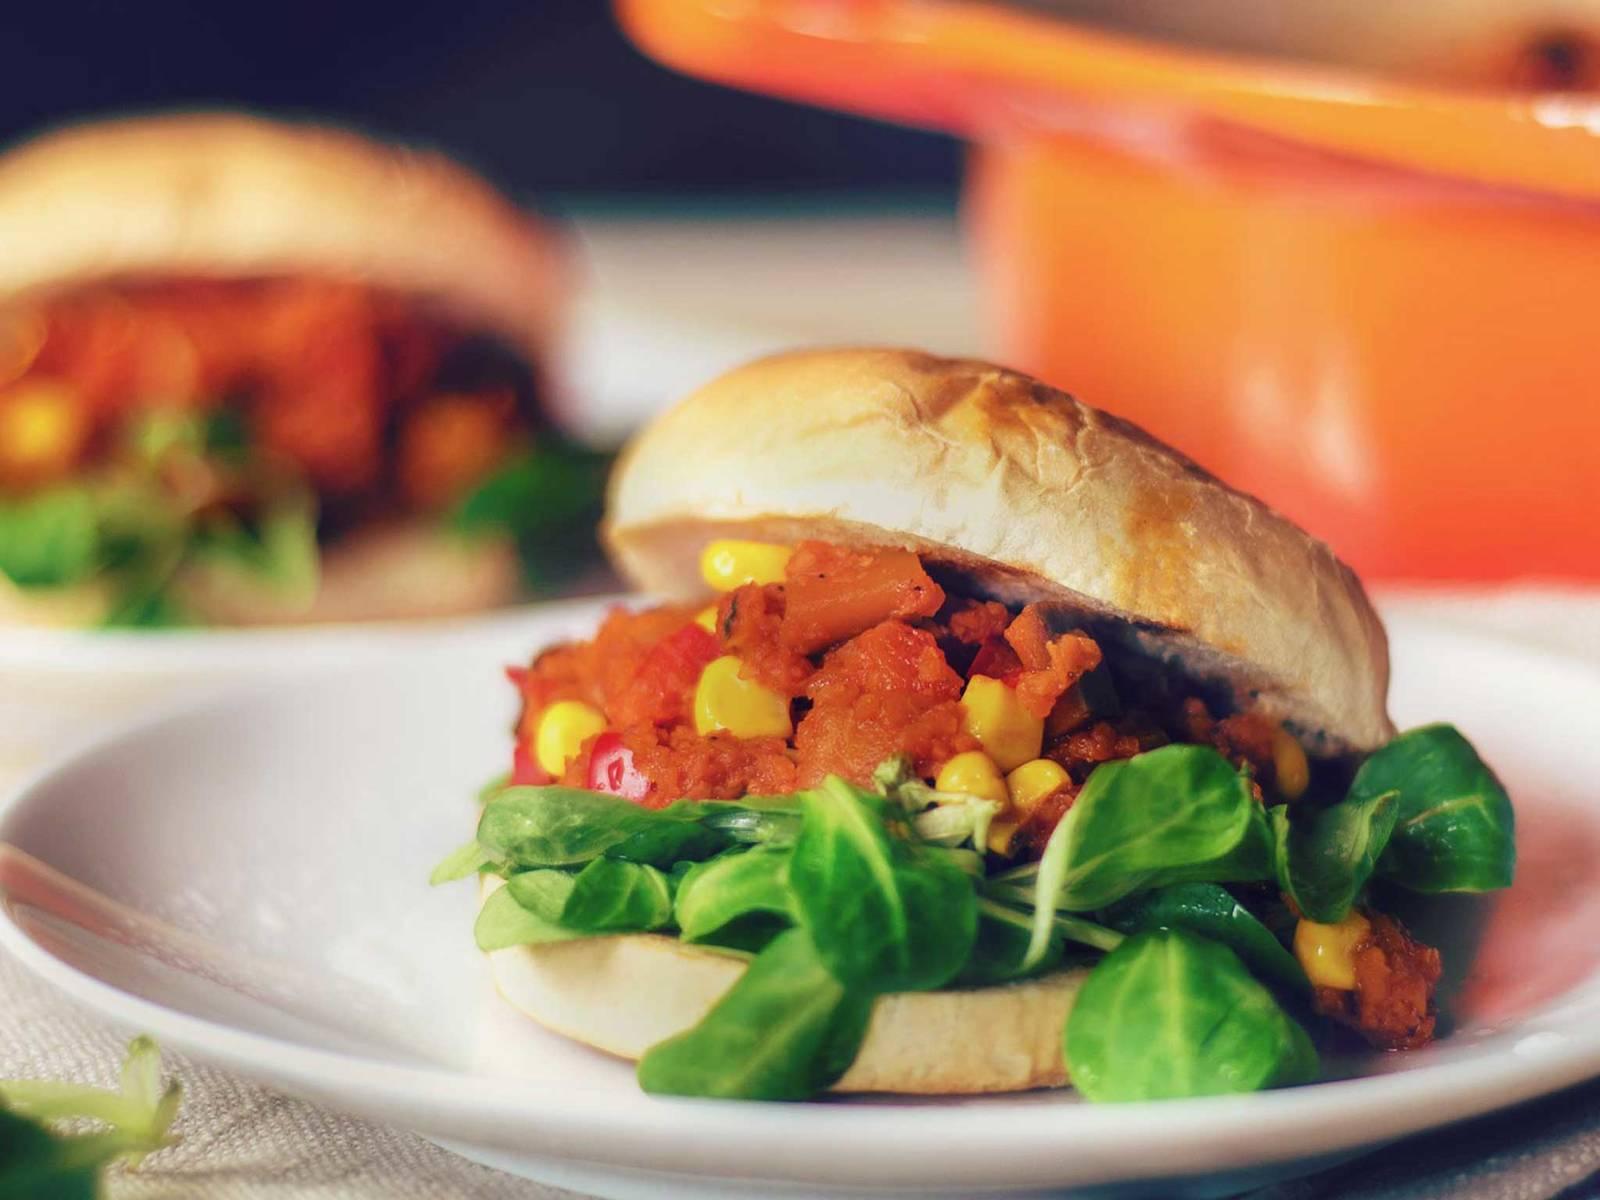 Vegan Sloppy Joe burger